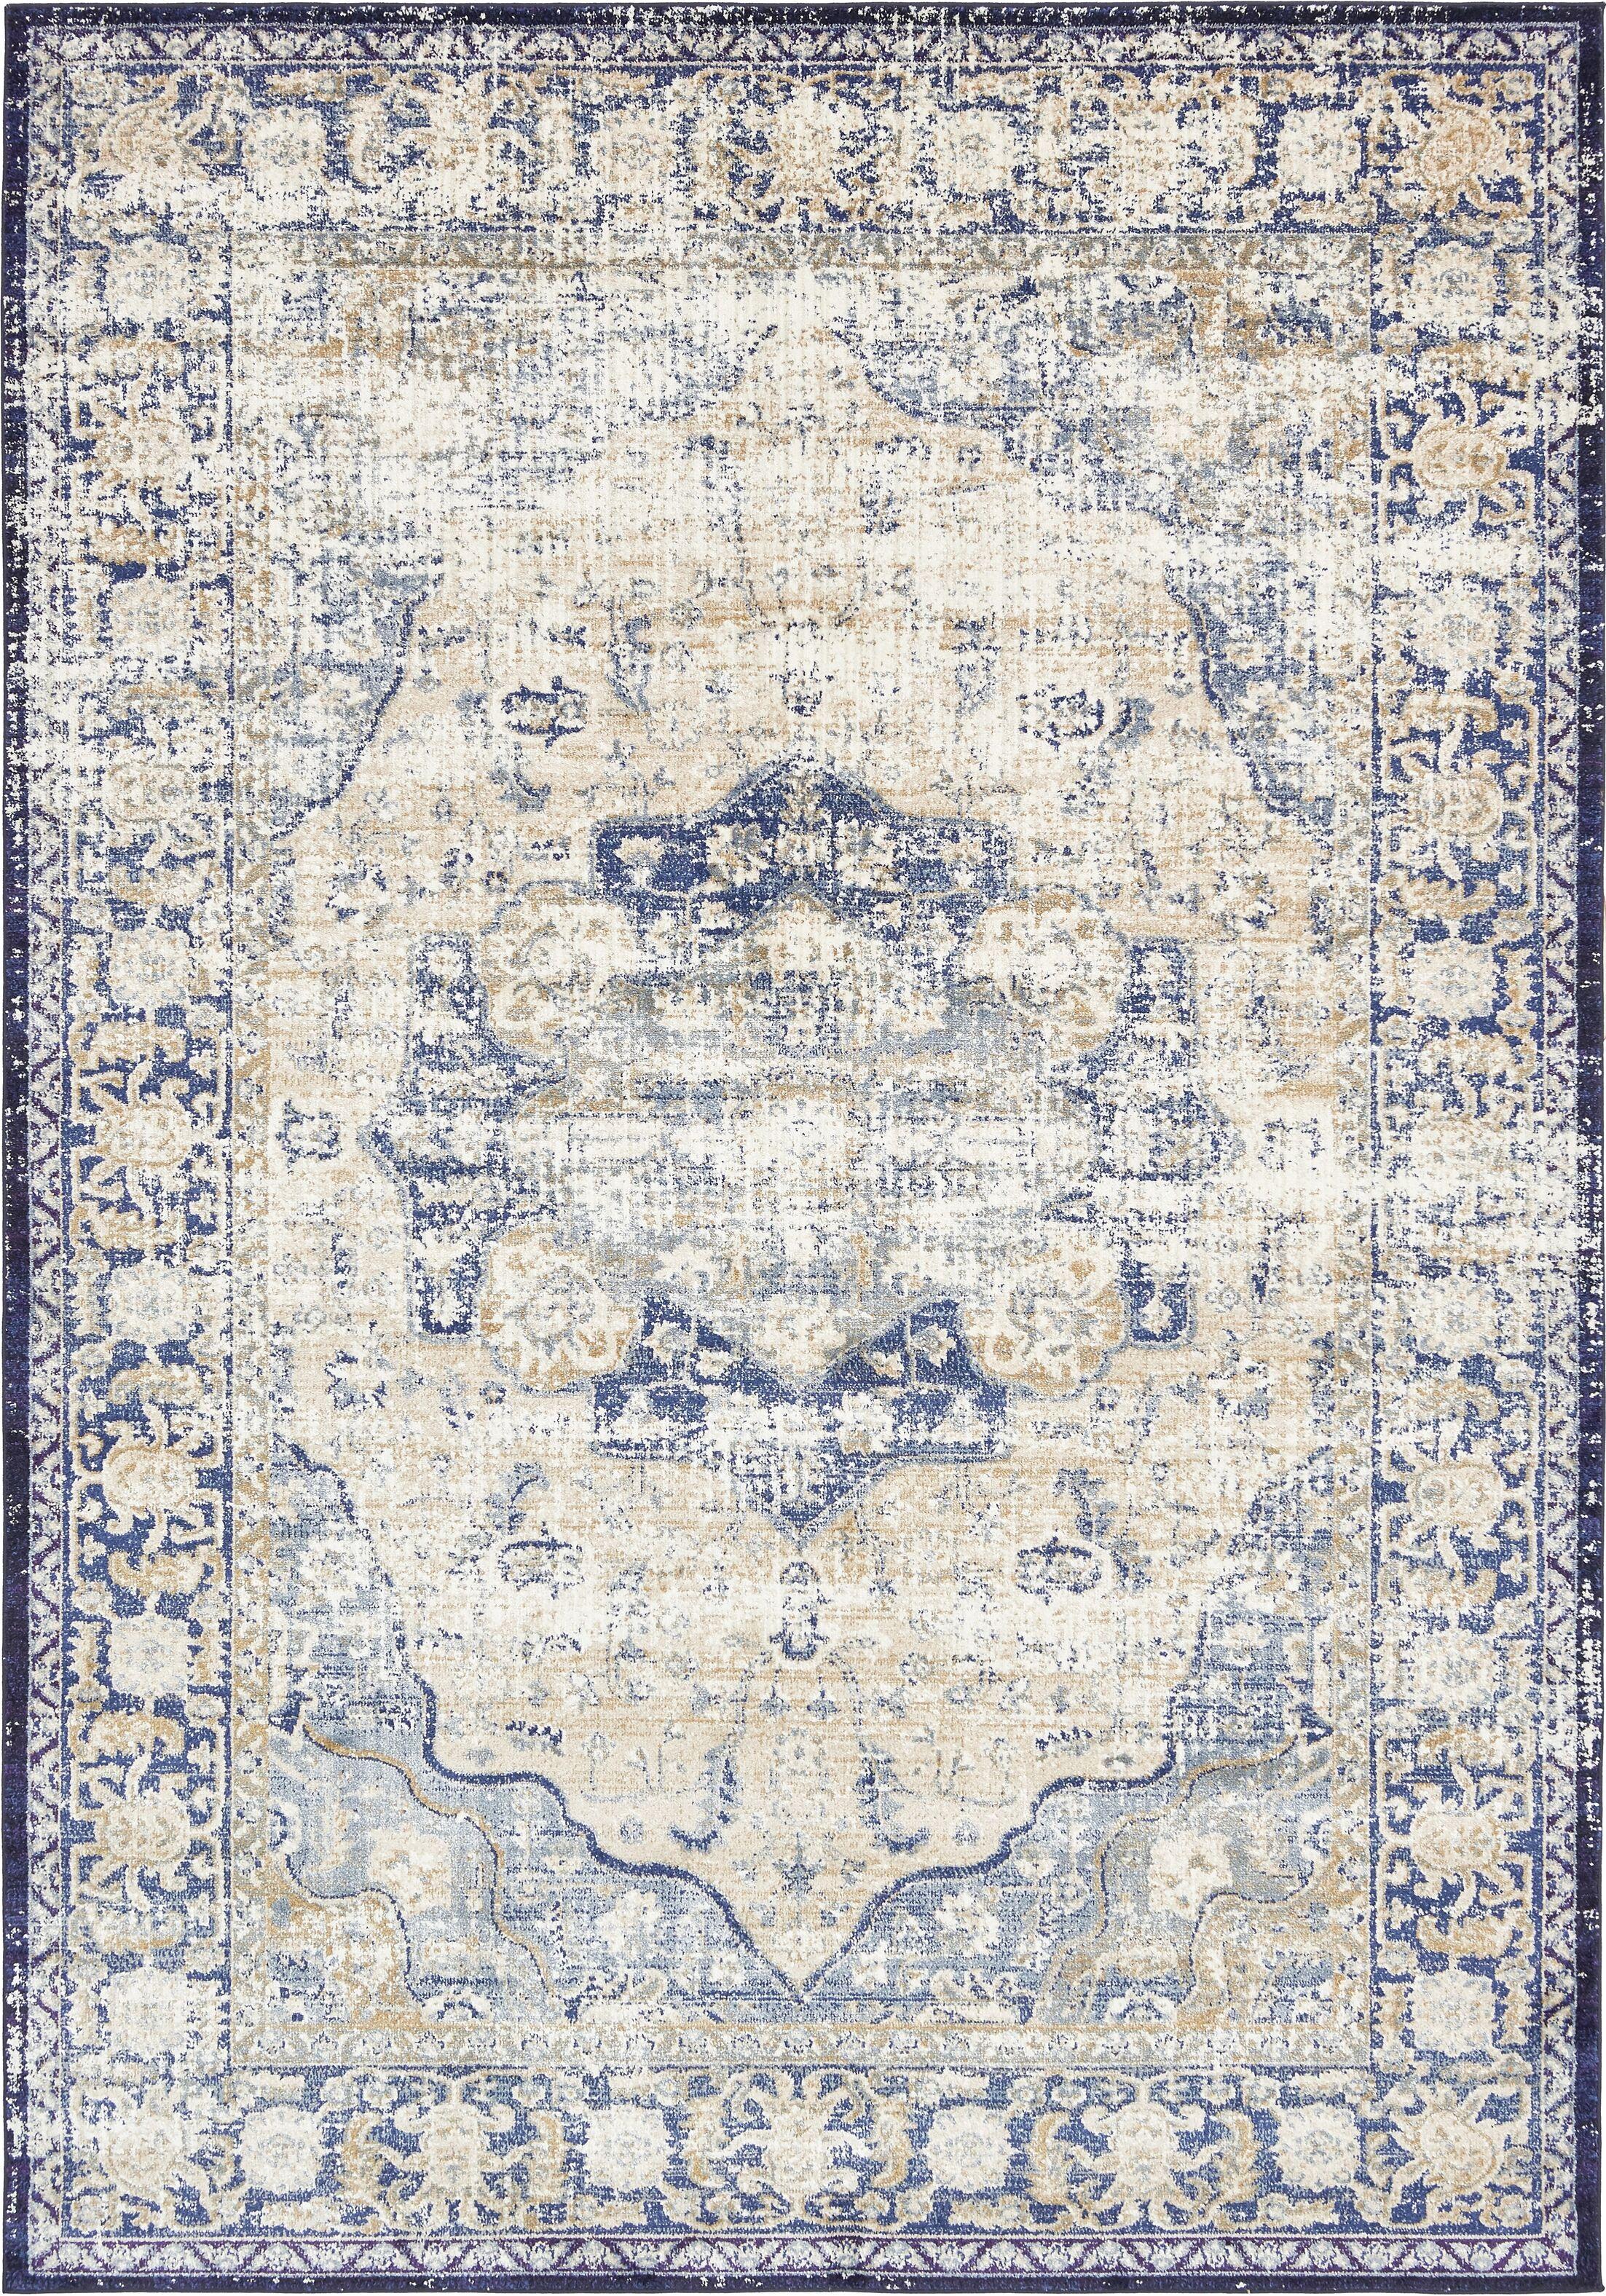 Koury Blue/Beige Area Rug Rug Size: Rectangle 7' x 10'